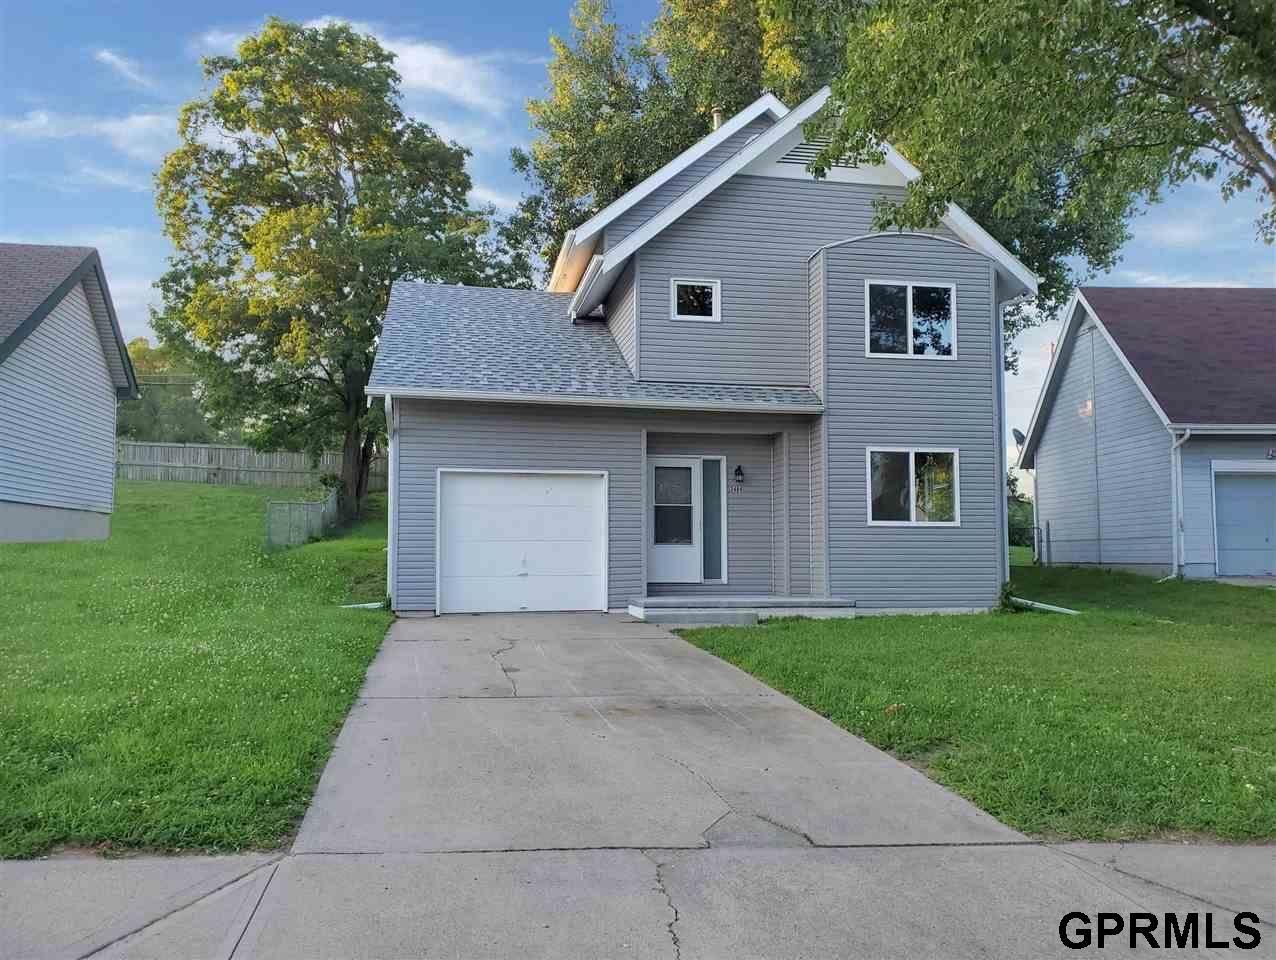 3464 Fowler Circle, Omaha, NE 68111 - MLS#: 22115518